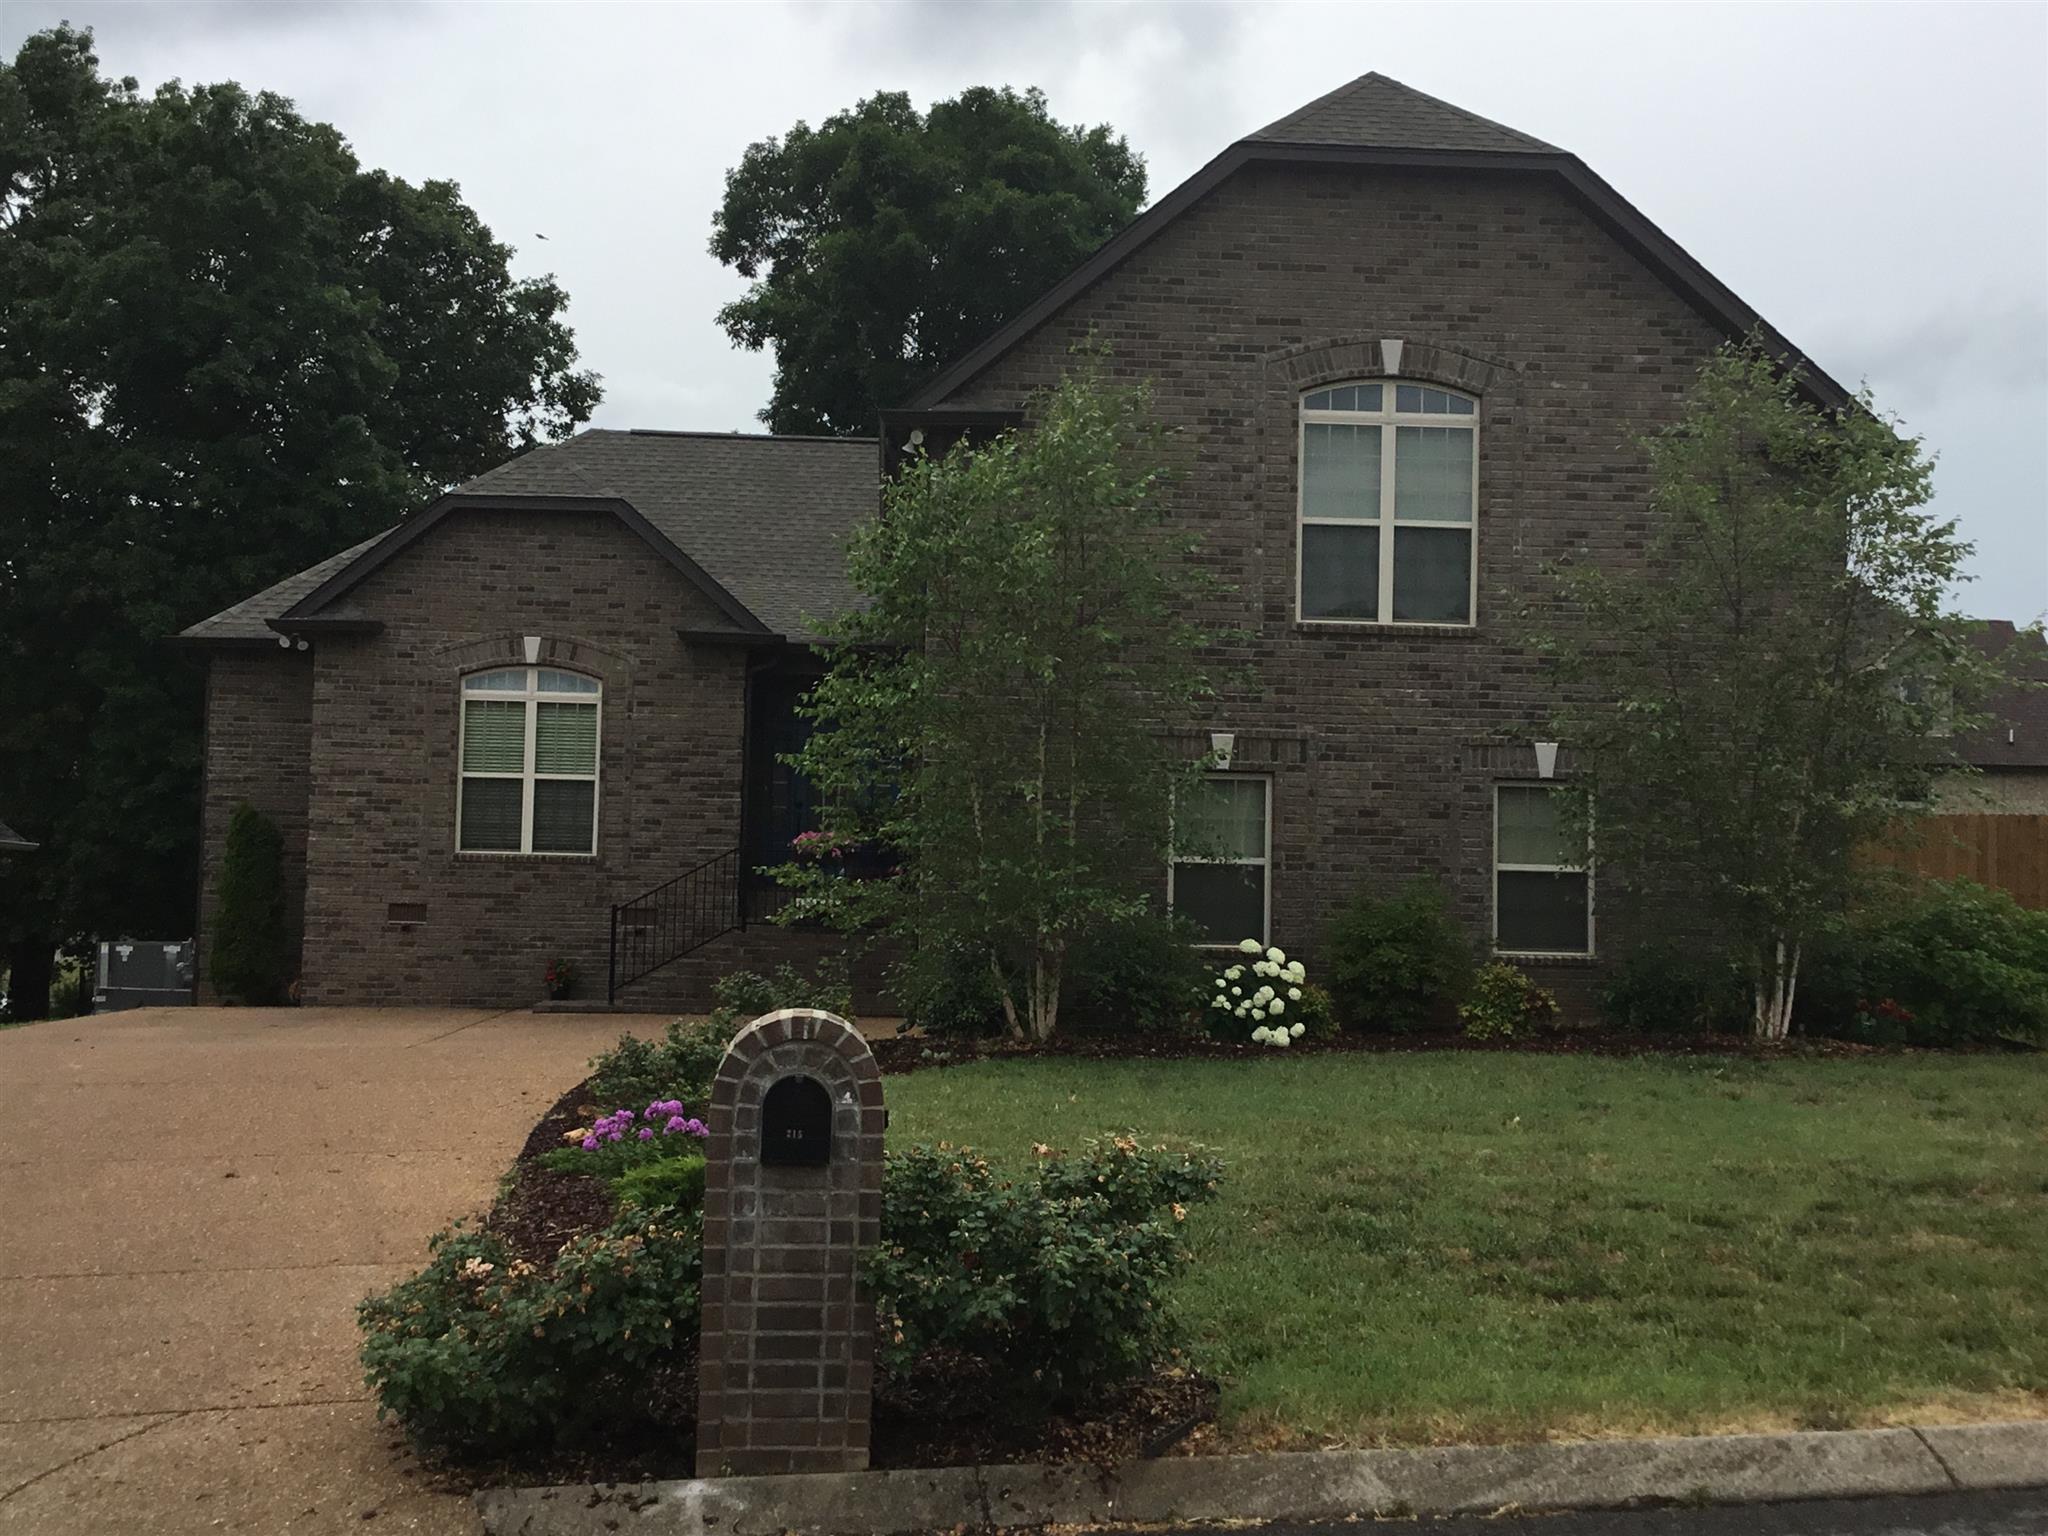 Stunning 4 BR/3BA With Bonus Room In Greystone Estates!  215 Bedrock Dr. Lot 46, White House, TN.  37188